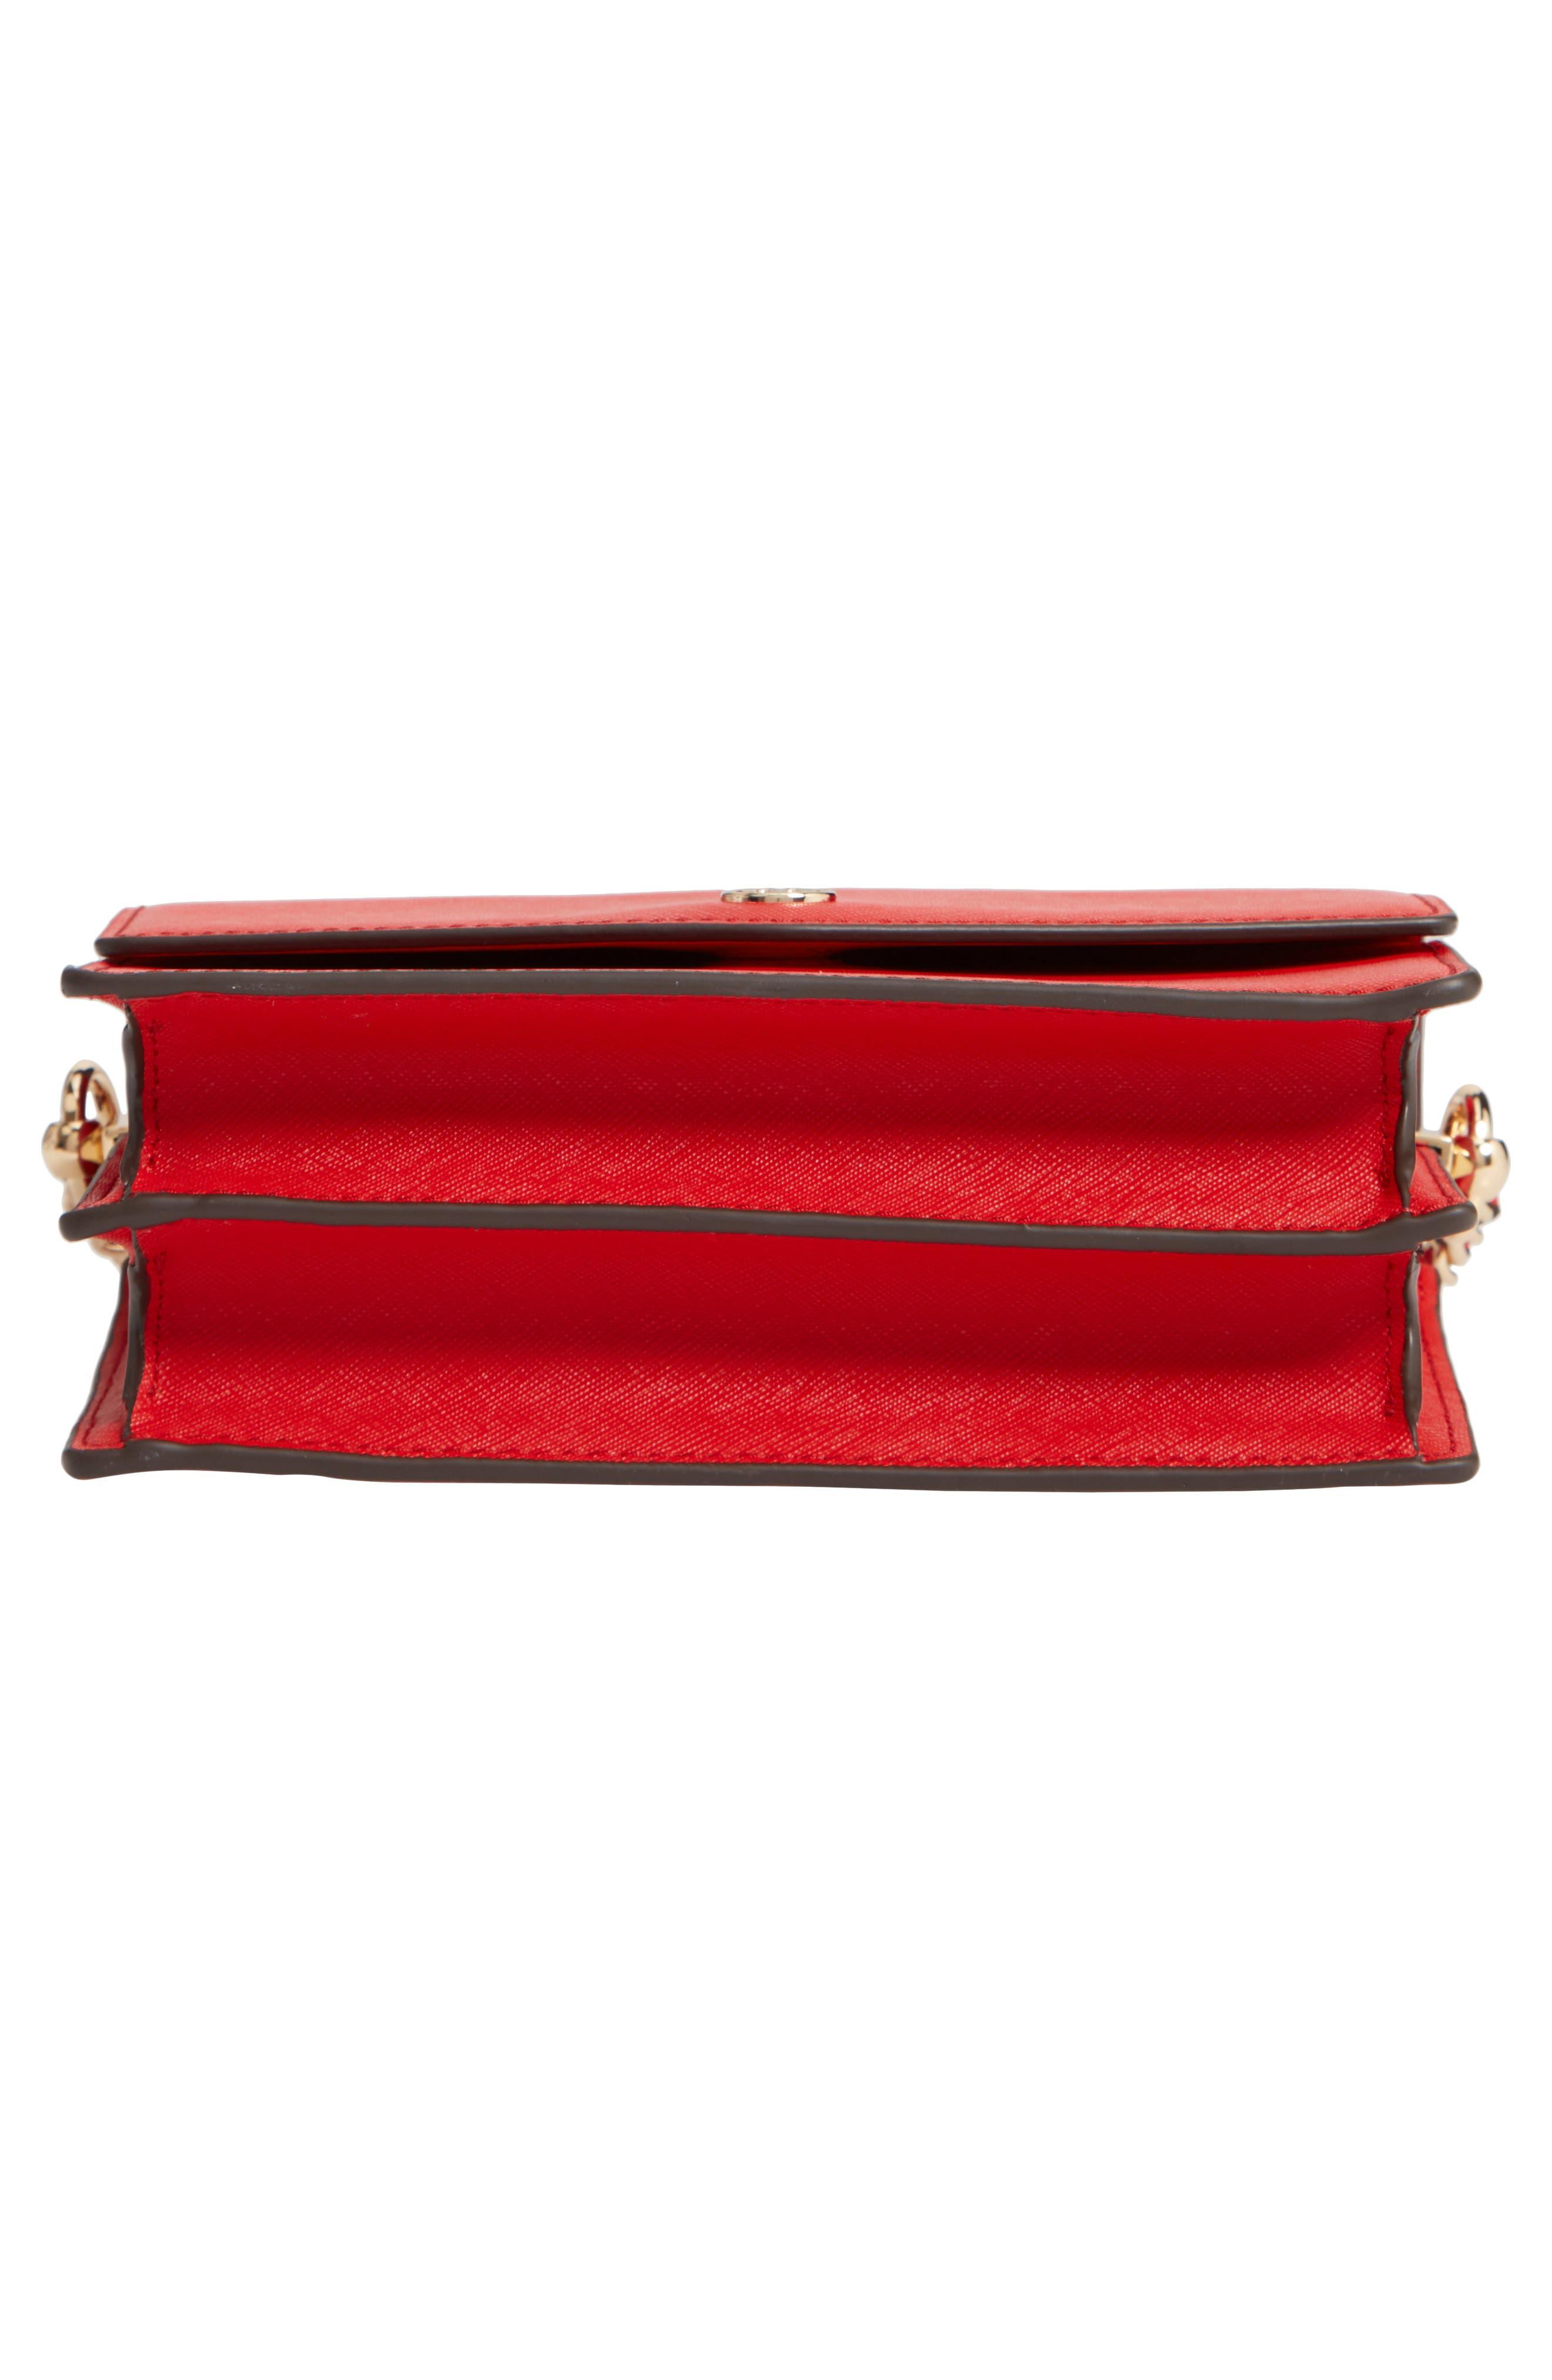 Mini Robinson Convertible Leather Shoulder Bag,                             Alternate thumbnail 6, color,                             BRILLIANT RED